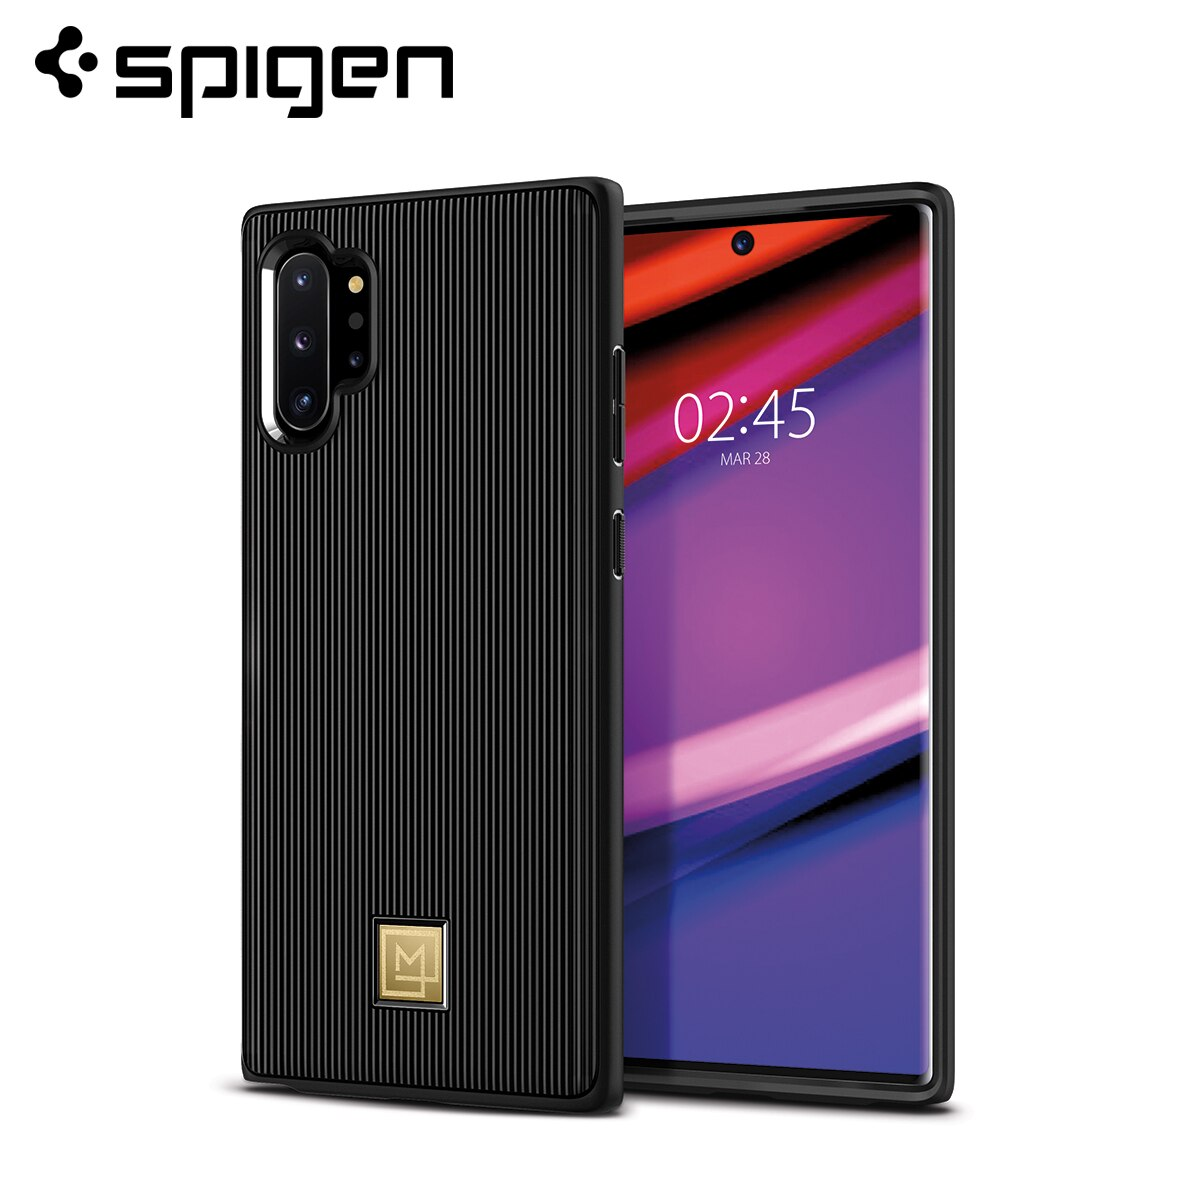 Spigen La Manon elegante de moda negro Funda flexible de TPU para Samsung Galaxy Nota 10 Plus/Galaxy Nota 10